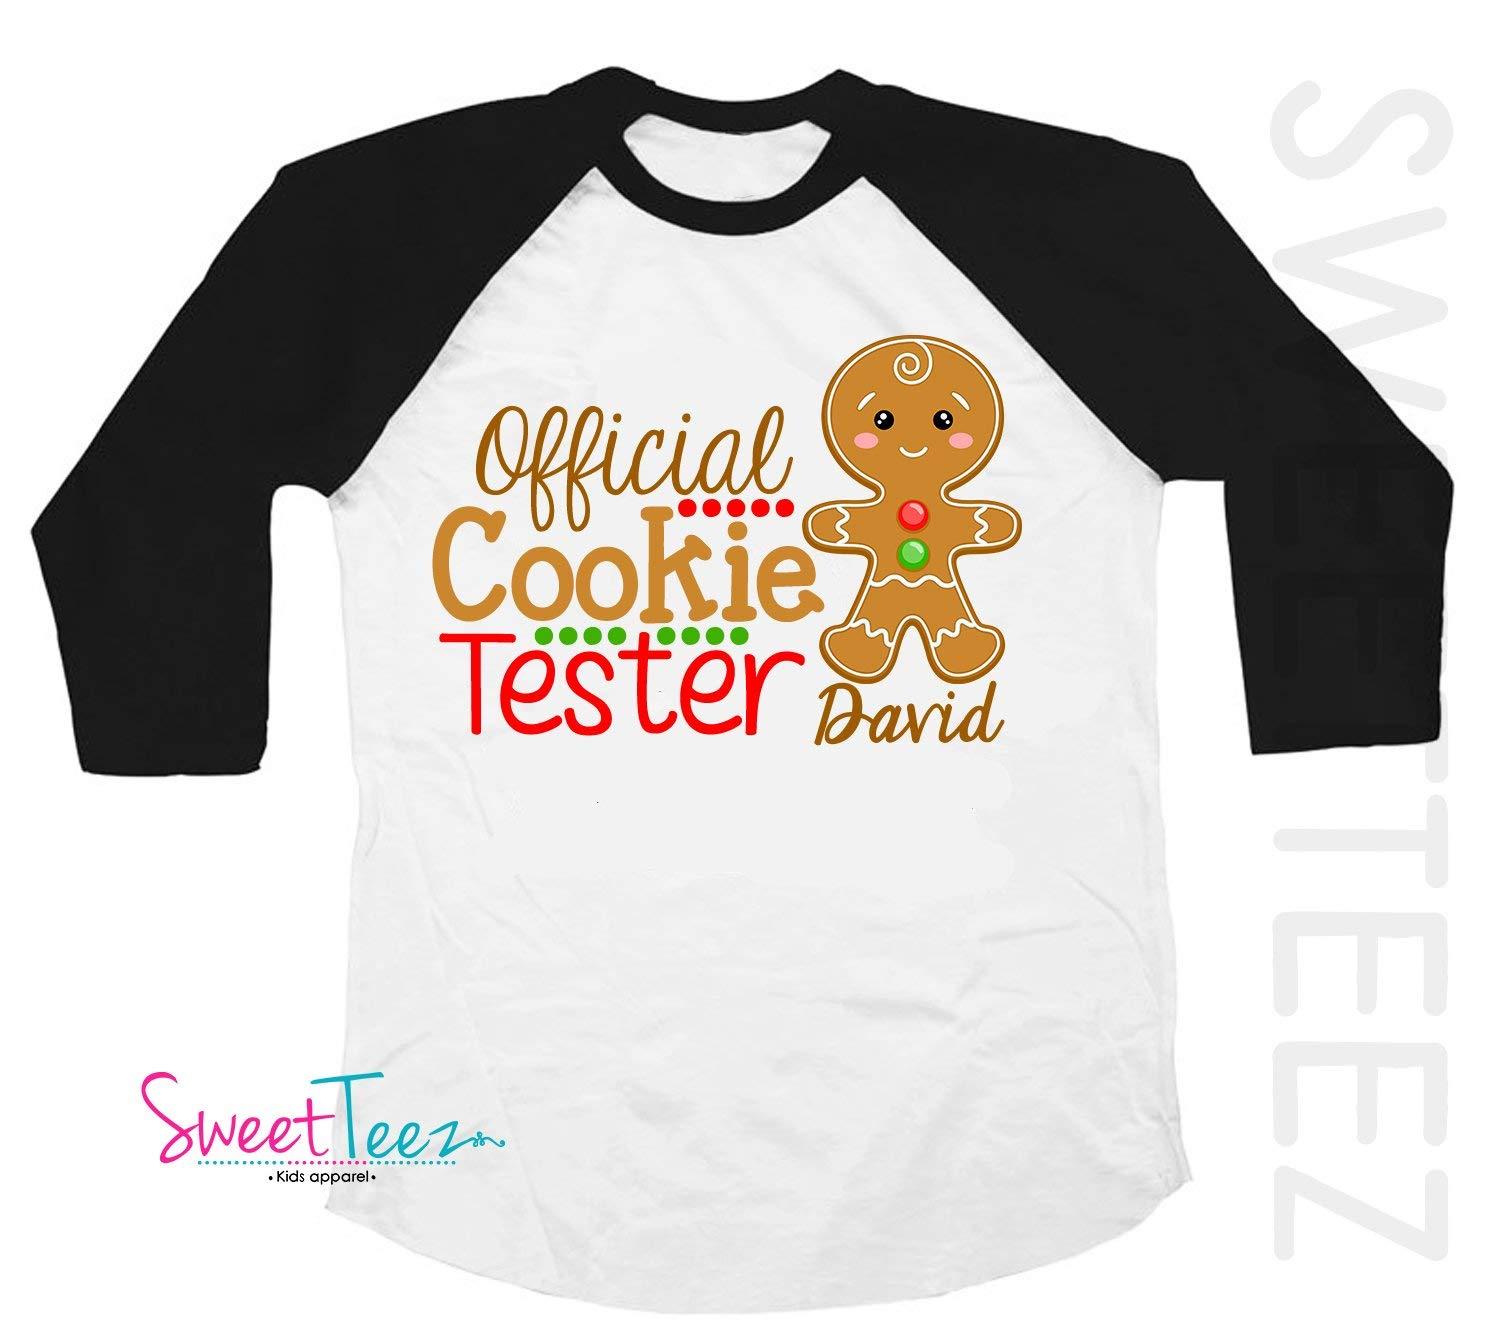 7d266fabc264 Get Quotations · Cookie Tester Shirt Personalized Christmas Shirt  Gingerbread Shirt Boy Girl Black Raglan